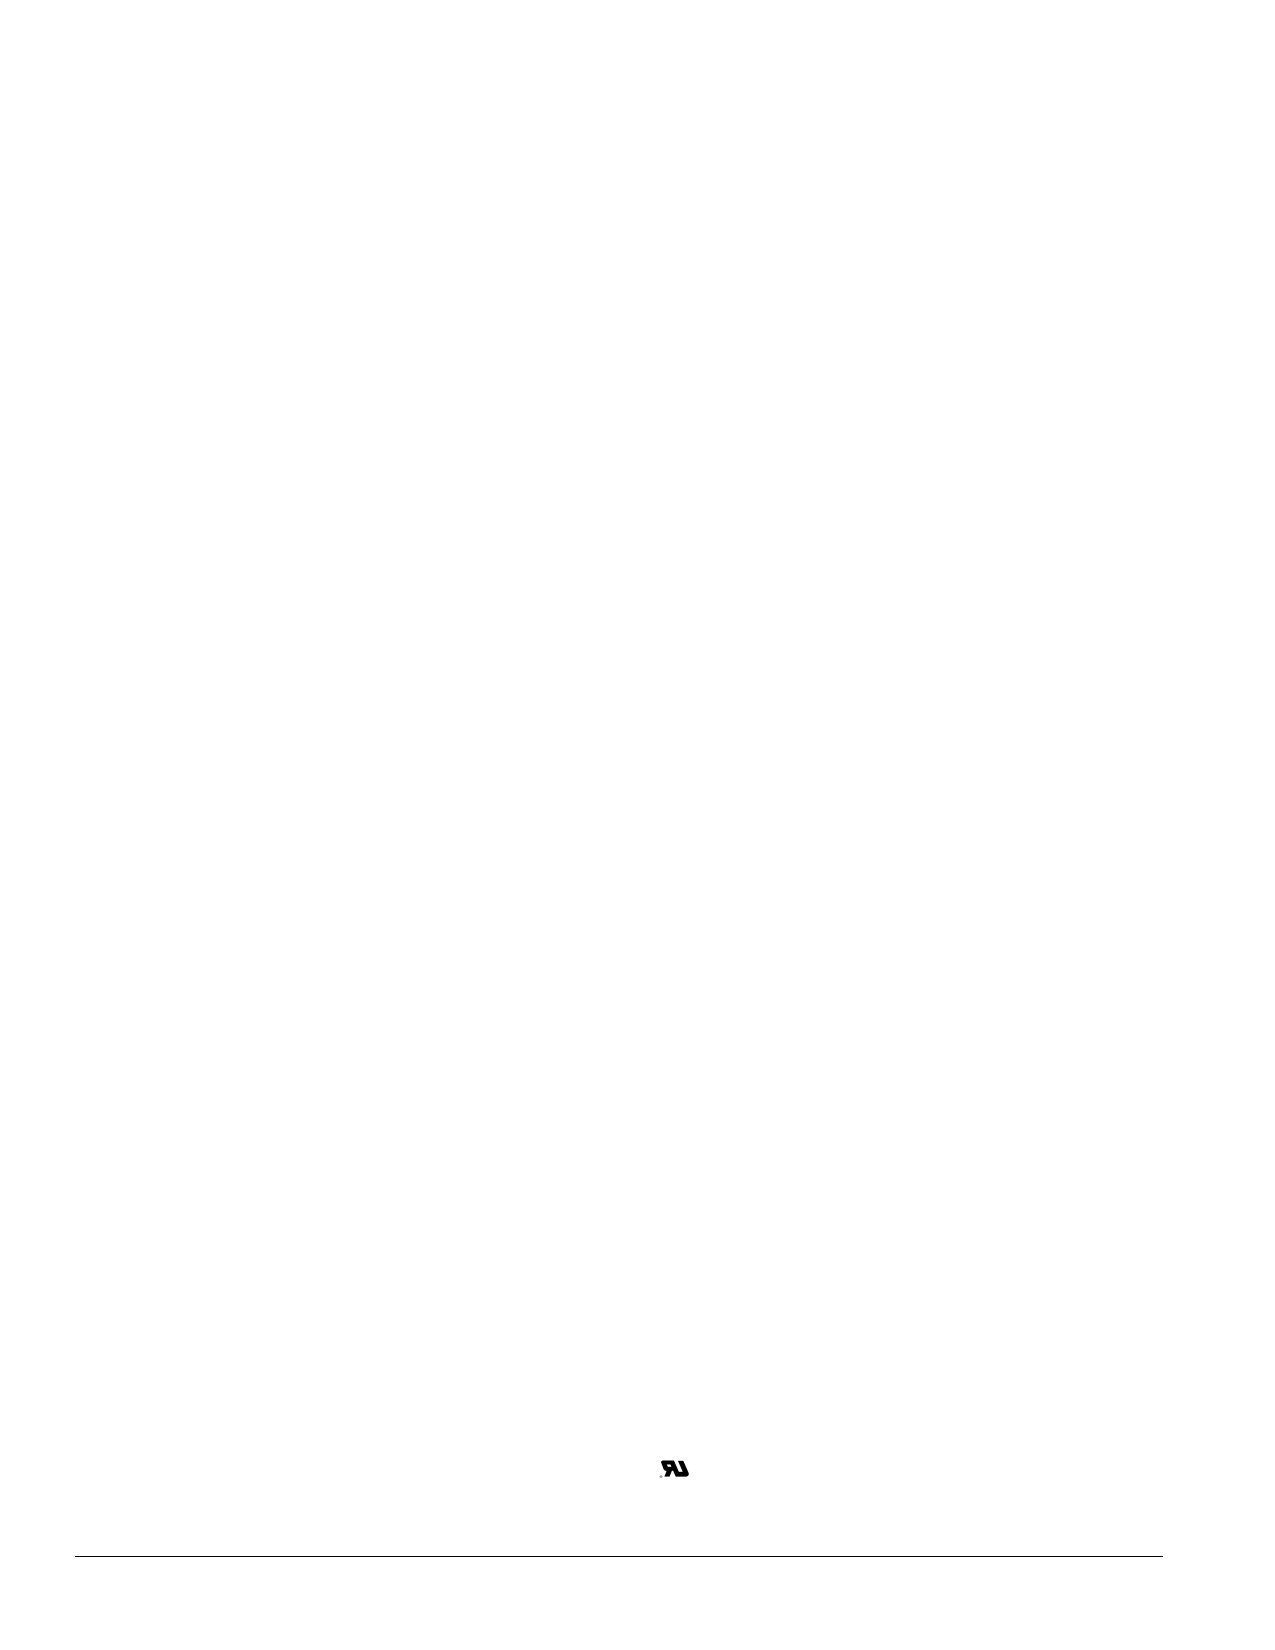 K1050F70 Даташит, Описание, Даташиты